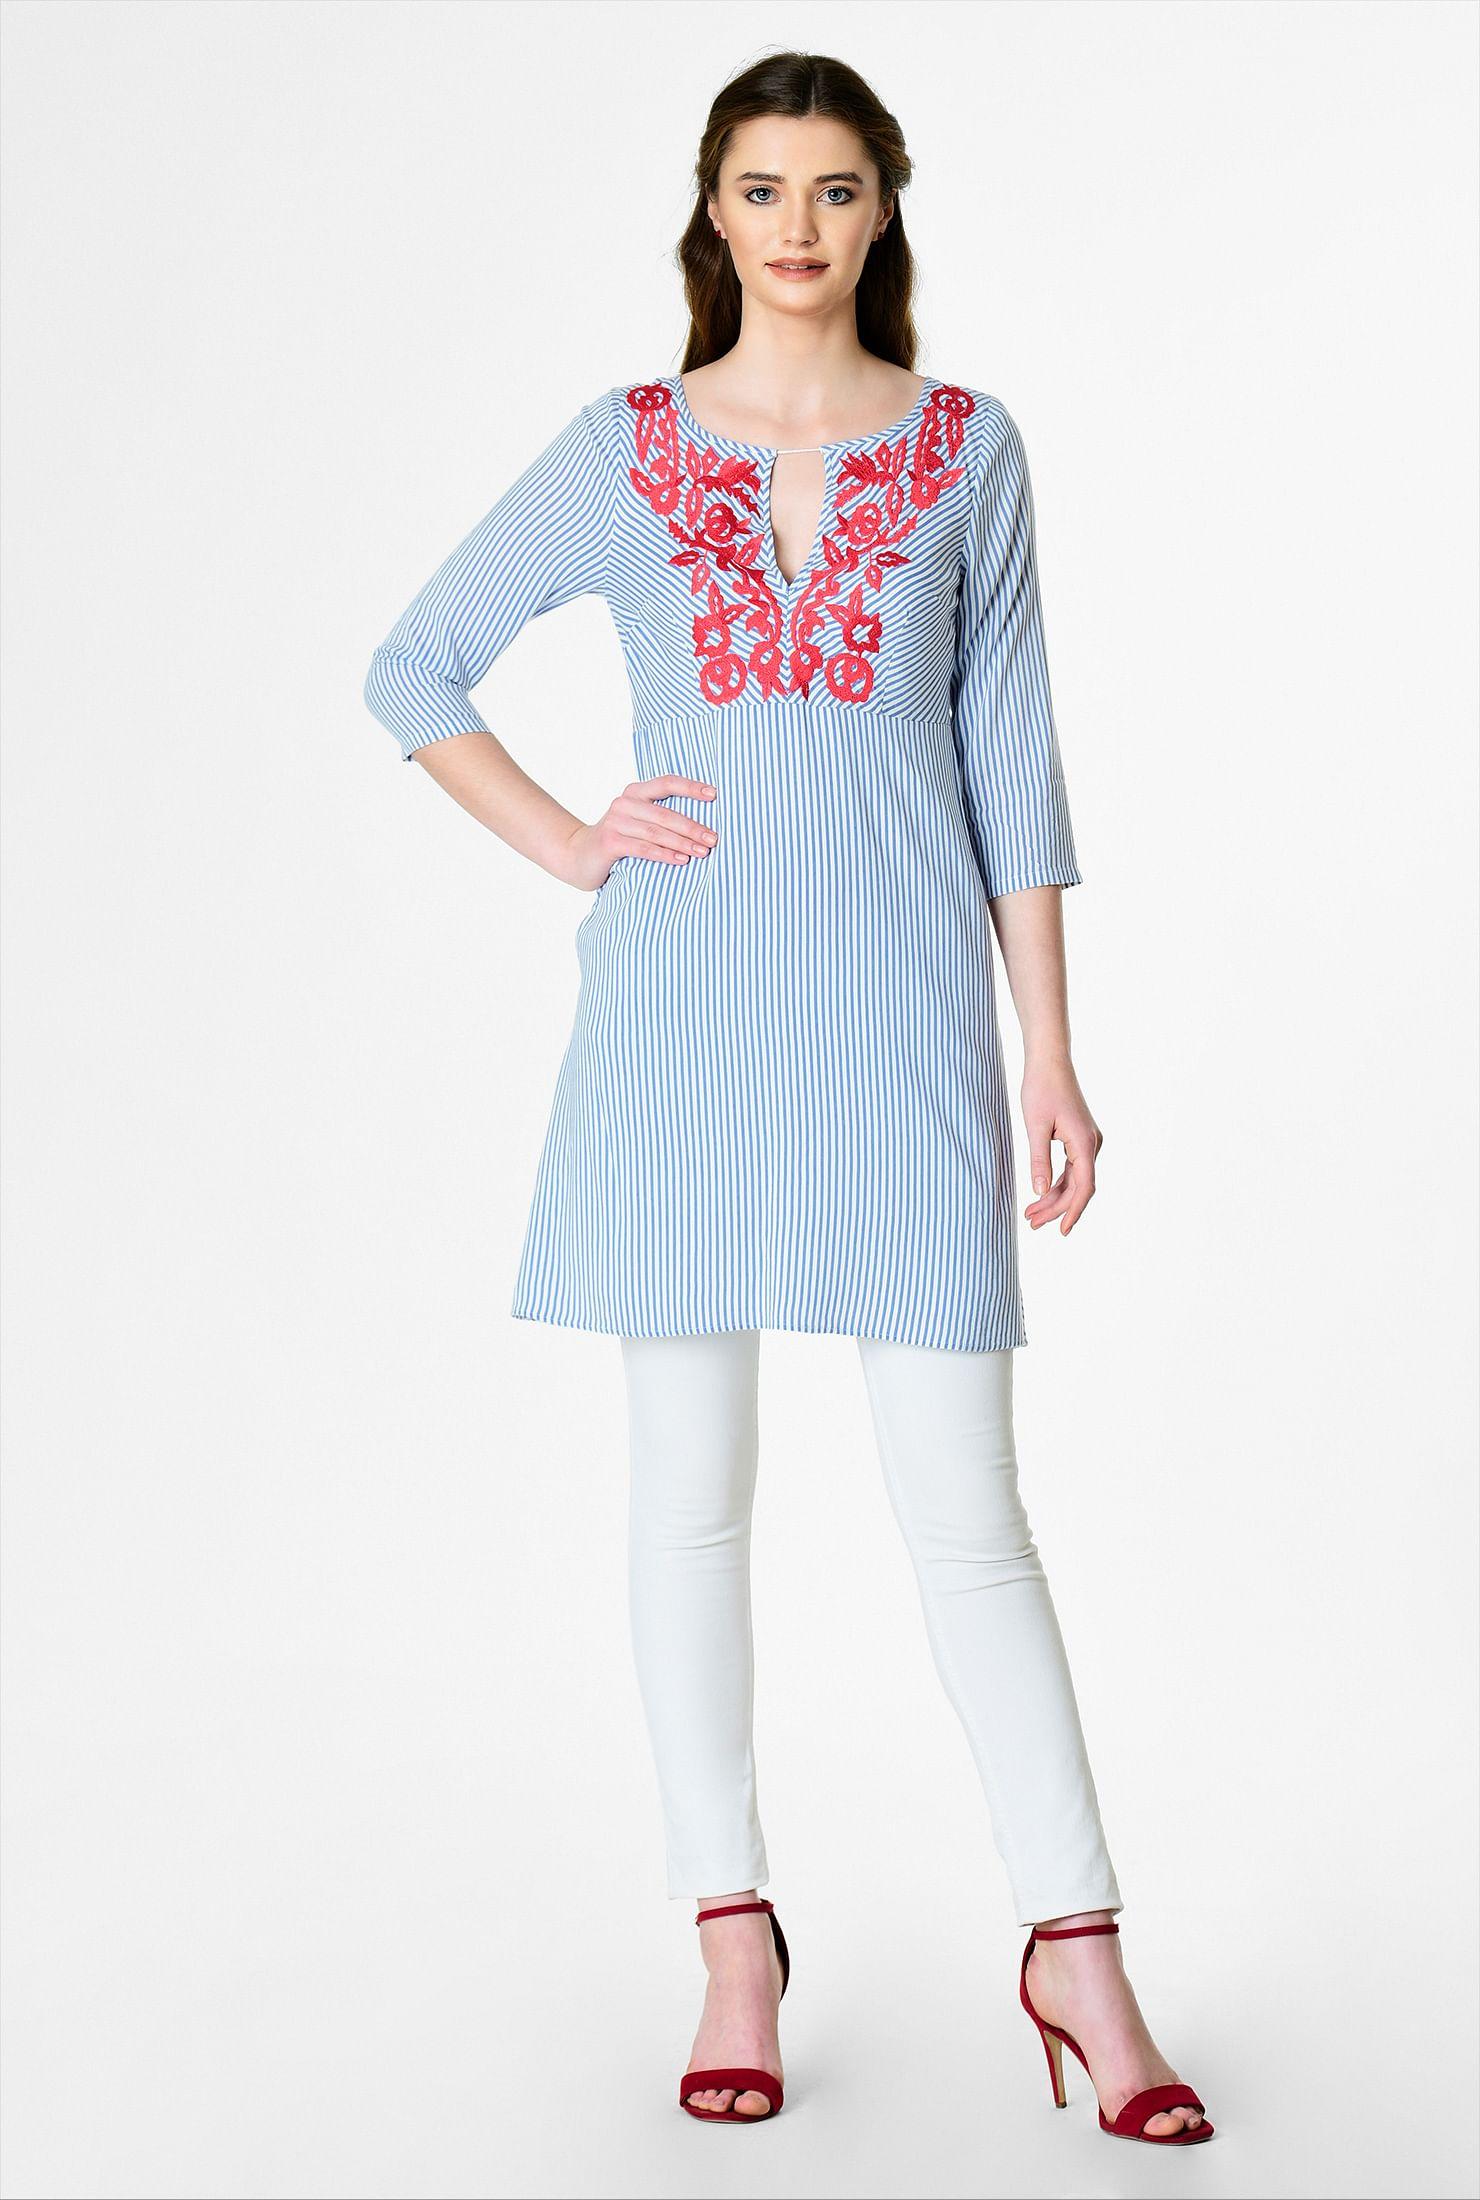 6777ce77bc2 Women's Fashion Clothing 0-36W and Custom